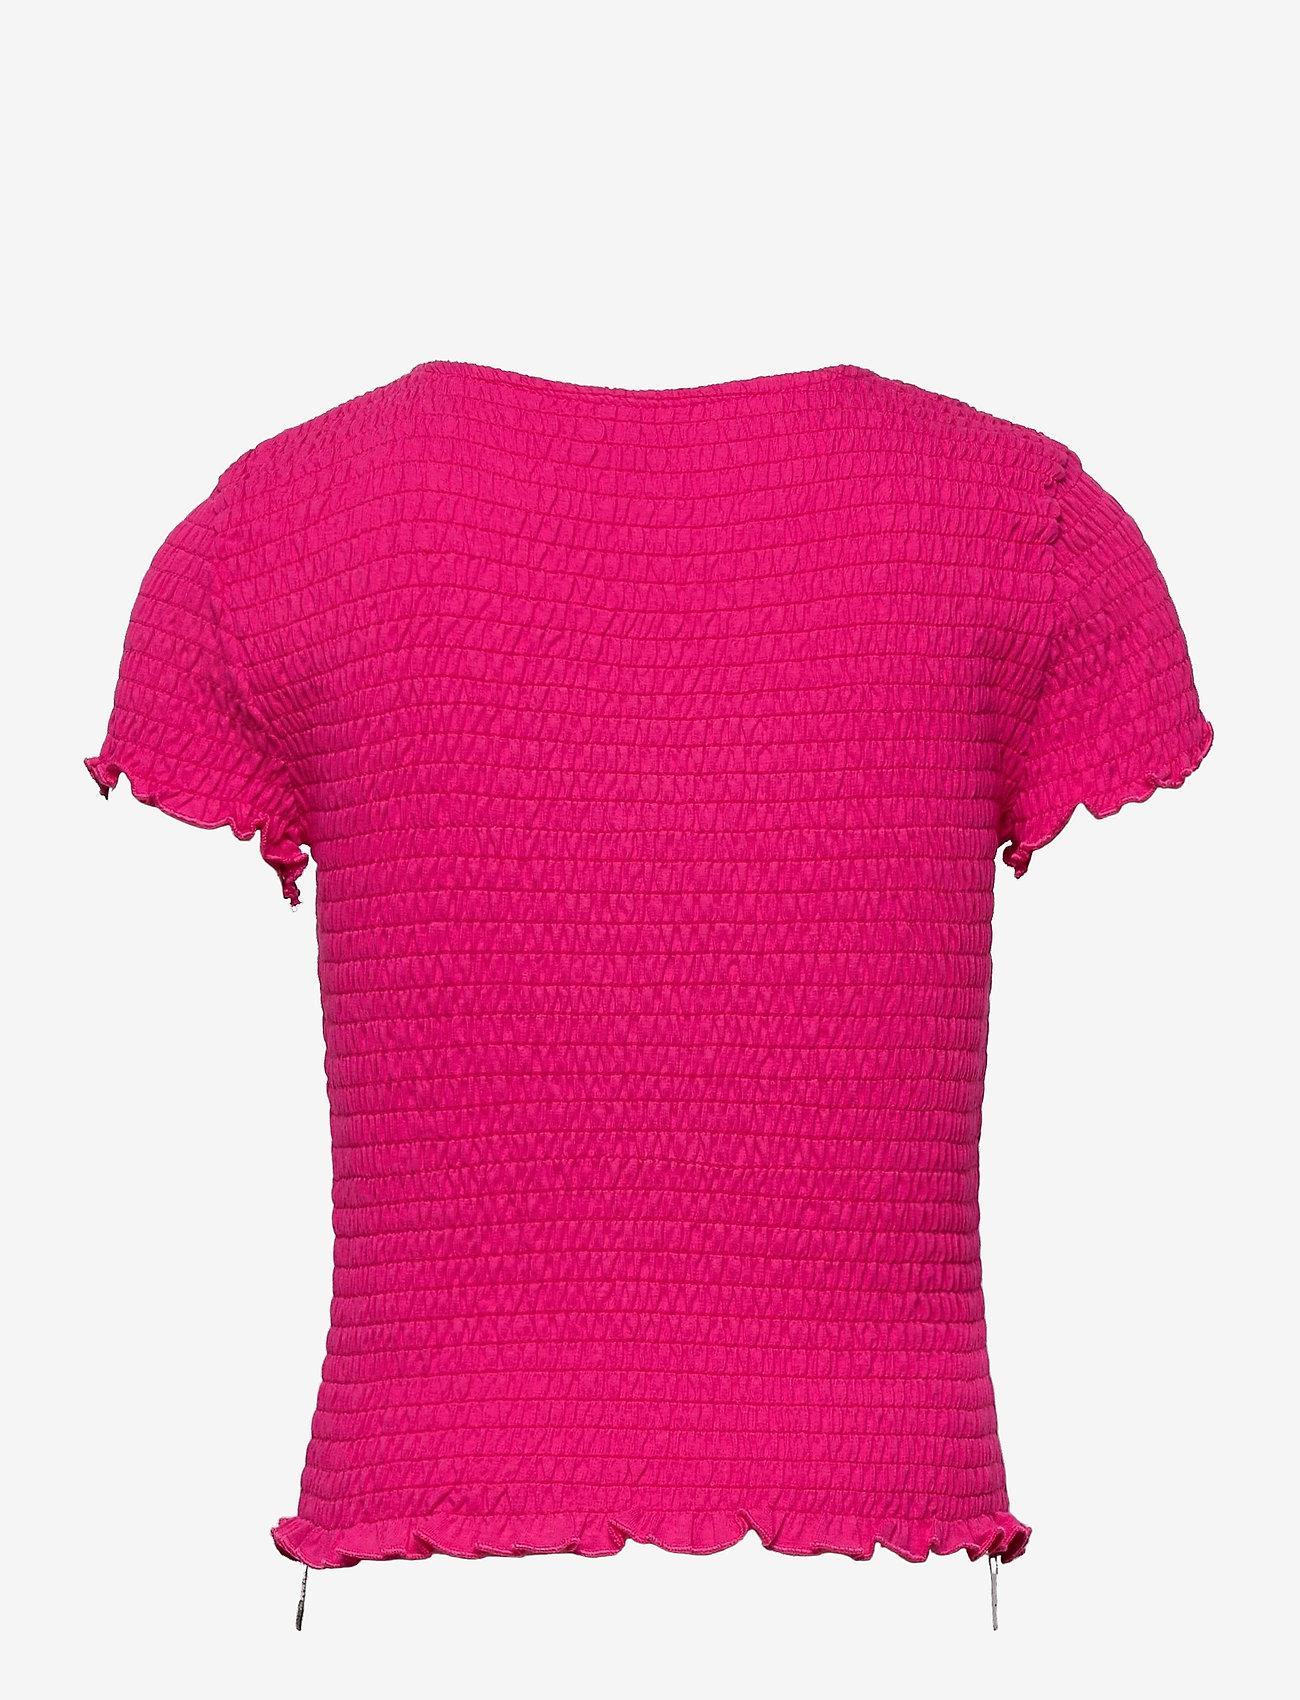 Kids Only - KONDELI LIFE S/S SMOCK TOP JRS - t-shirts - beetroot purple - 1